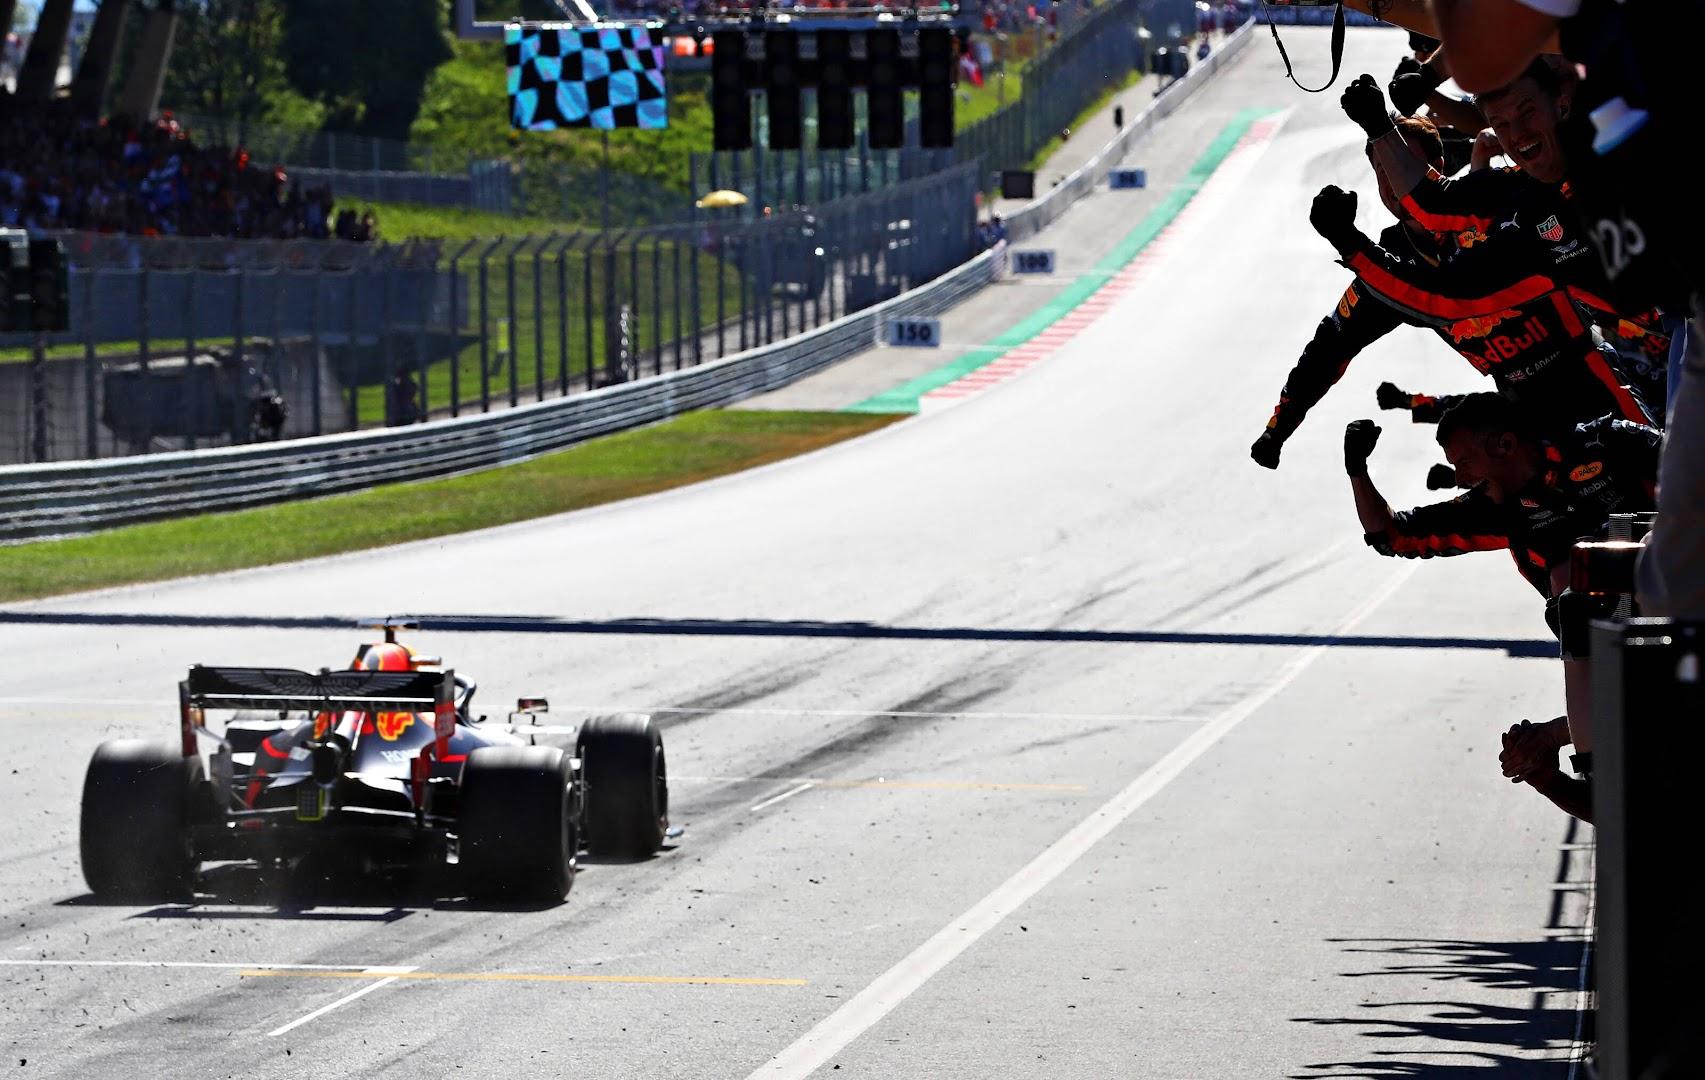 F1第9戦オーストリアGP、トロロッソ・ホンダのフェルスタッペンがトップチェッカー!